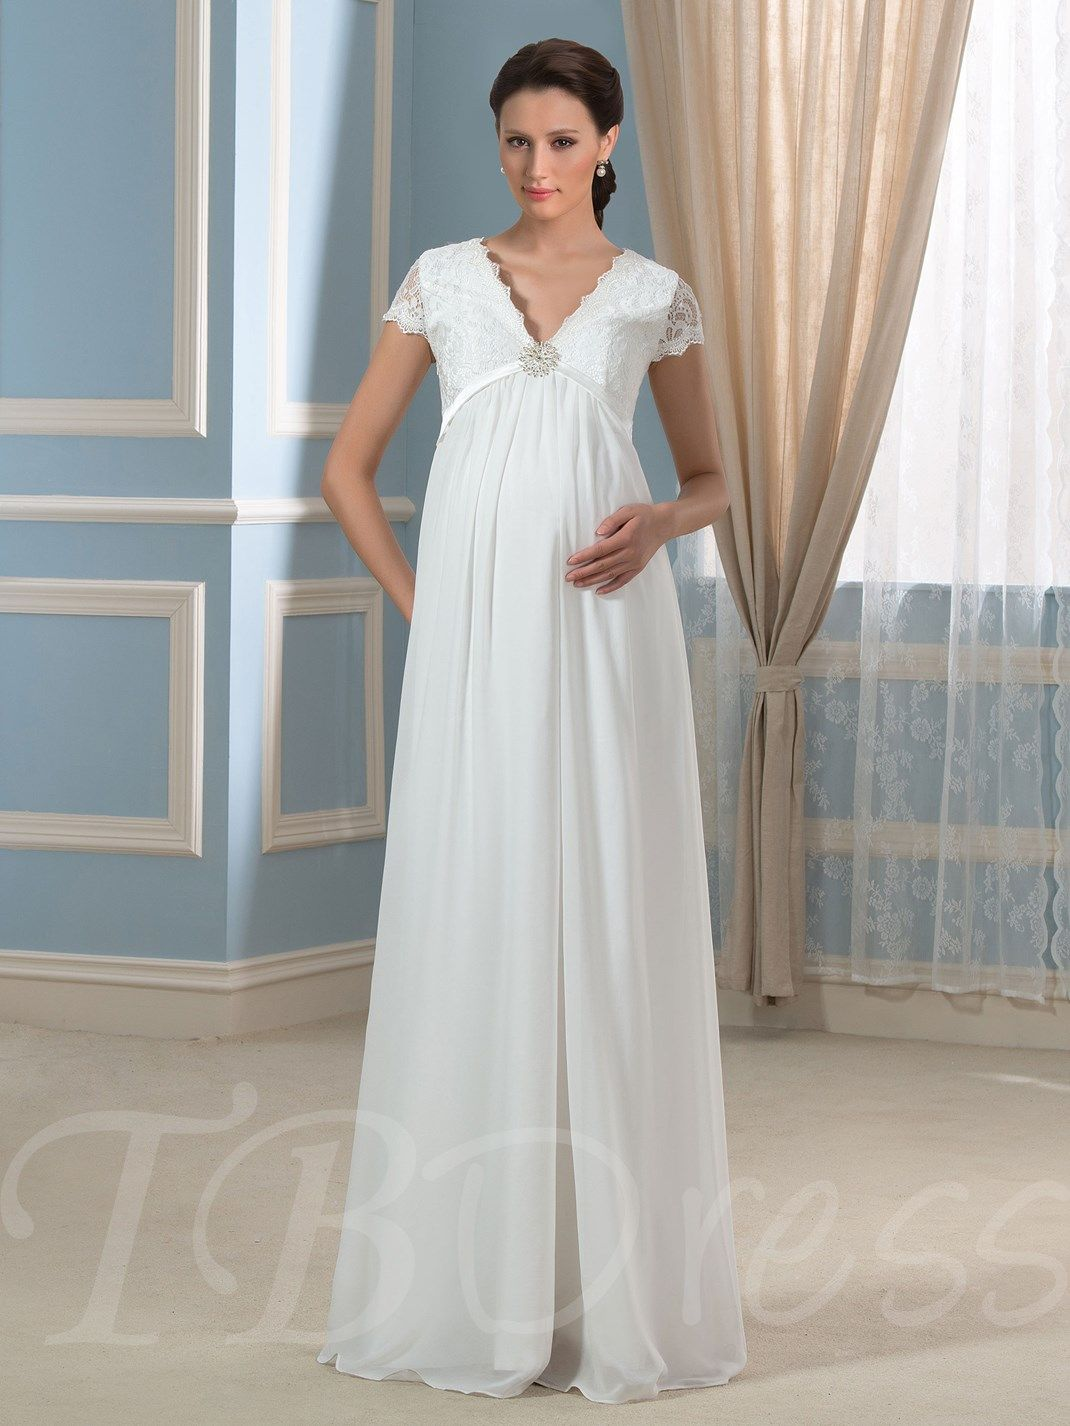 Cap Sleeve Empire Waist Lace Maternity Wedding Dress Lace Maternity Wedding Dresses Pregnant Wedding Dress Cheap Maternity Wedding Dresses